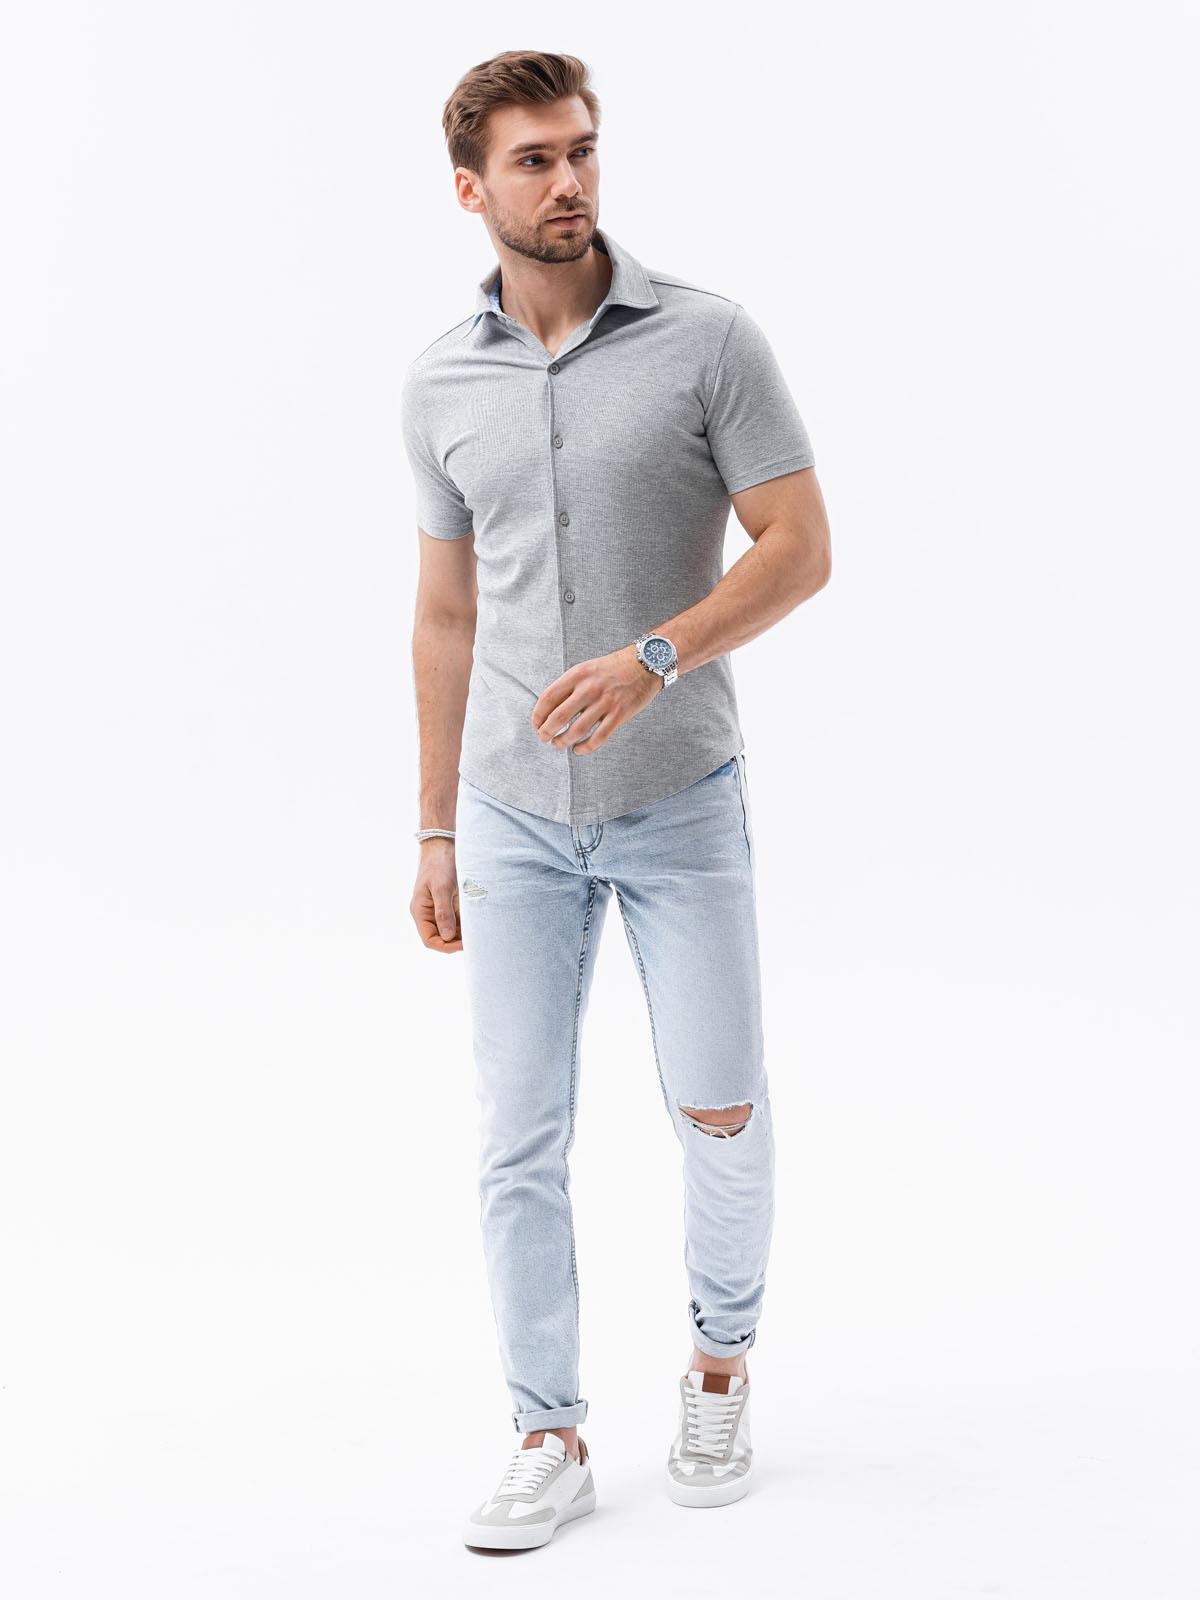 Koszula męska zkrótkim rękawem K541 - szara